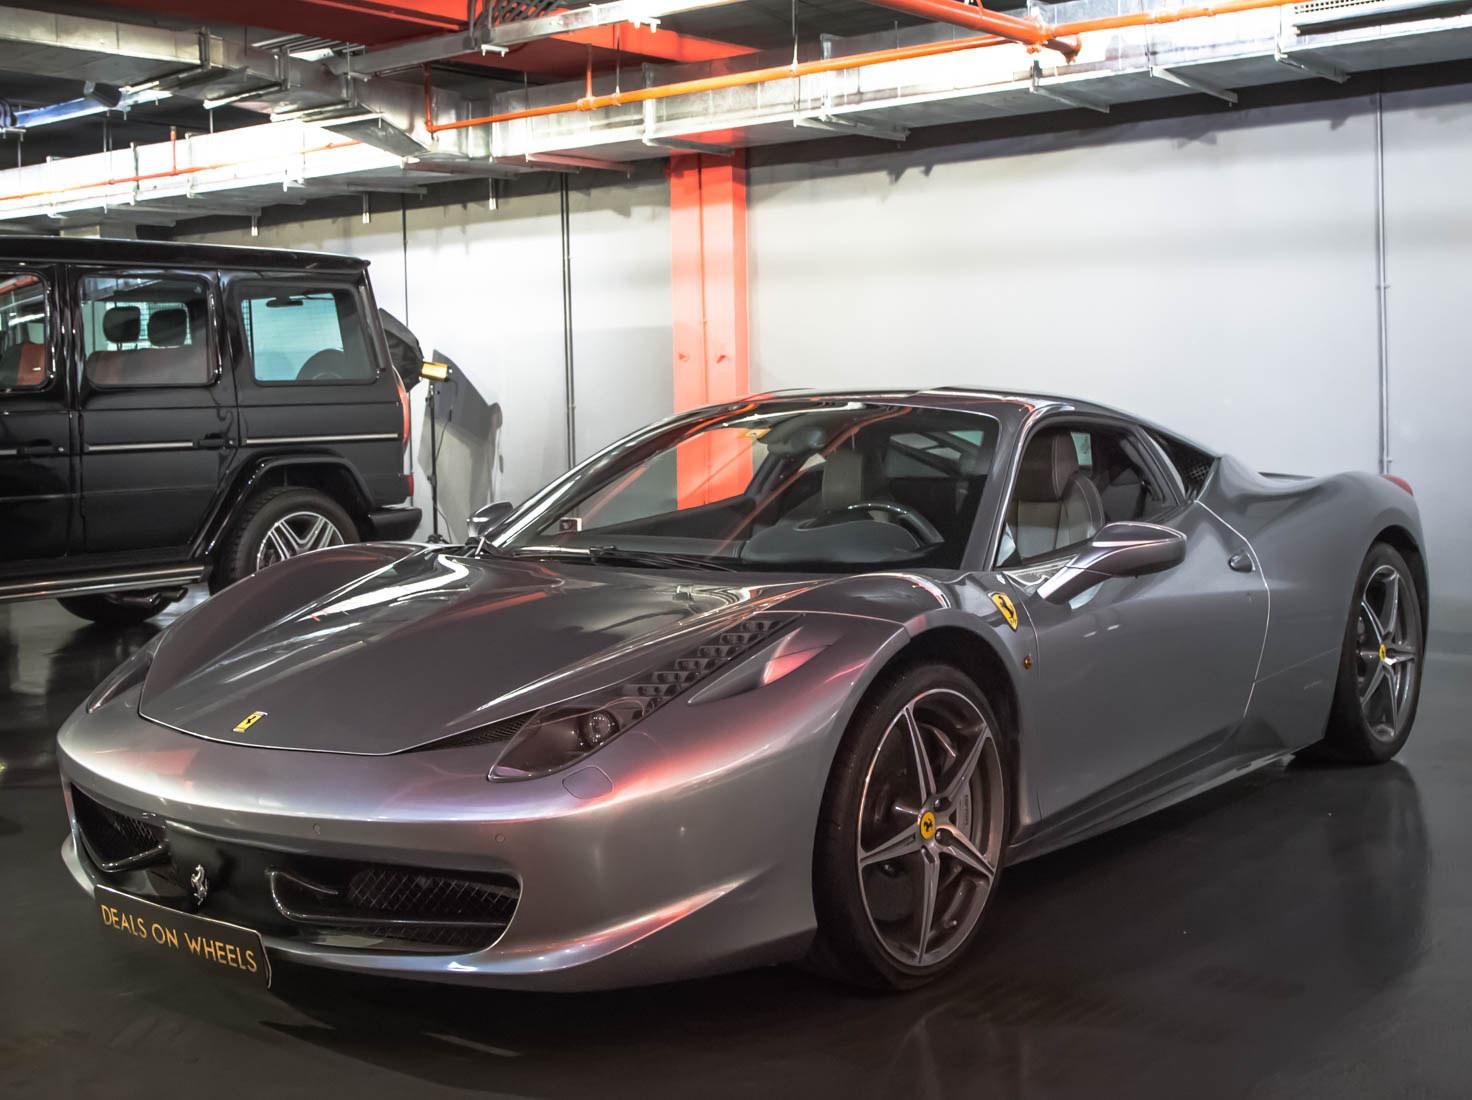 Used Ferrari 458 2013 Car For Sale In Dubai 769275